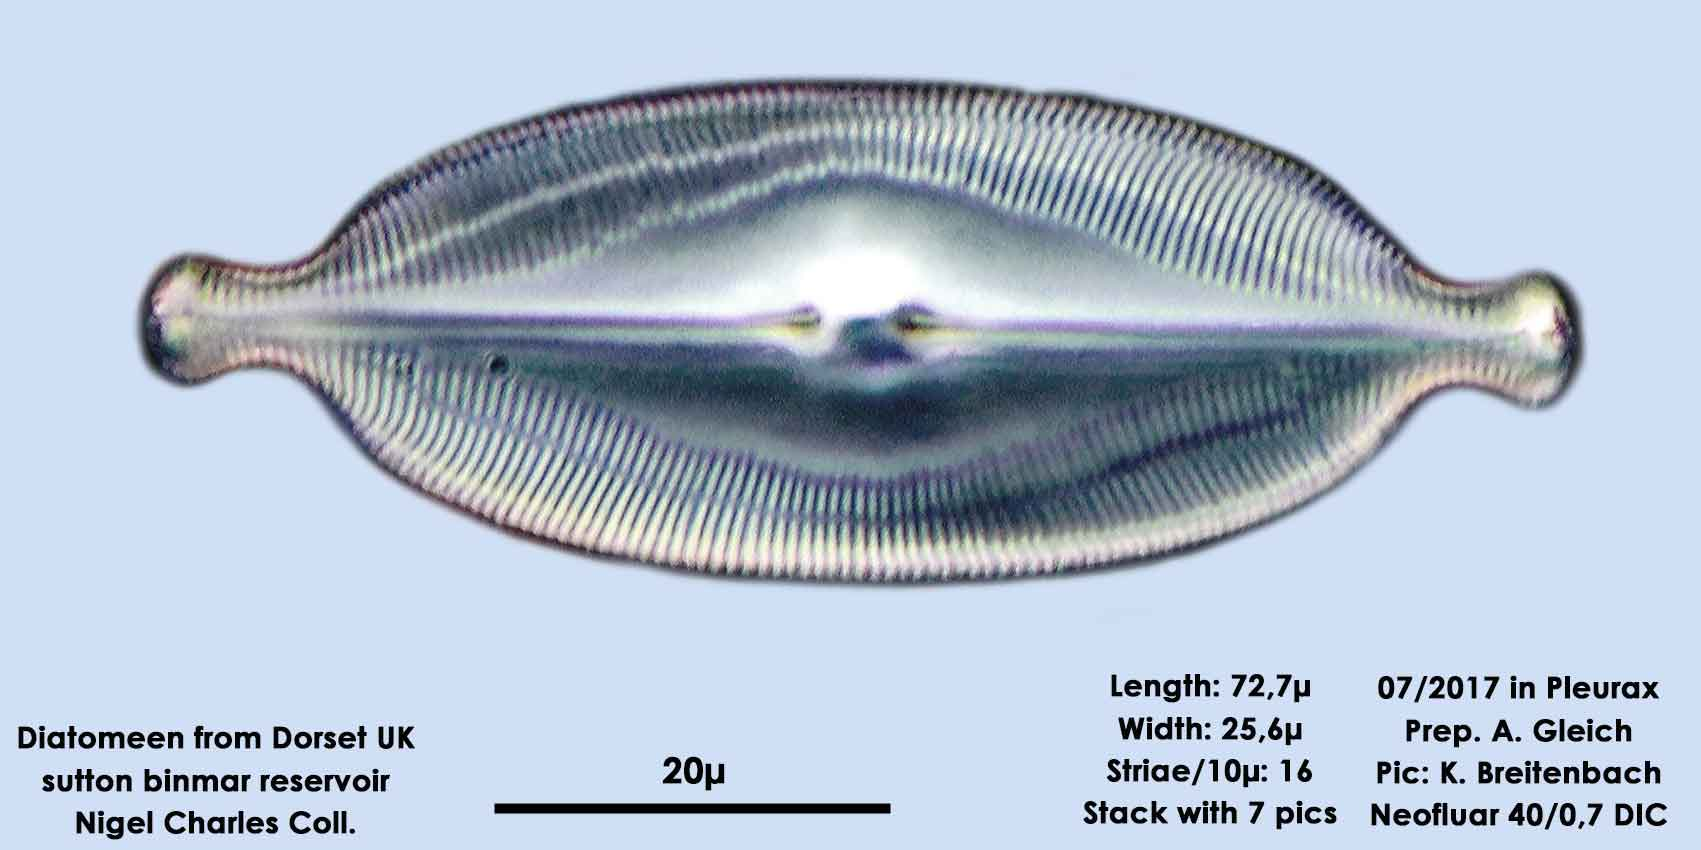 Bild 2 Diatomeen aus Dorset UK, Süßwasser. Art: Caloneis amphisbaena (Bory) Cleve 1894